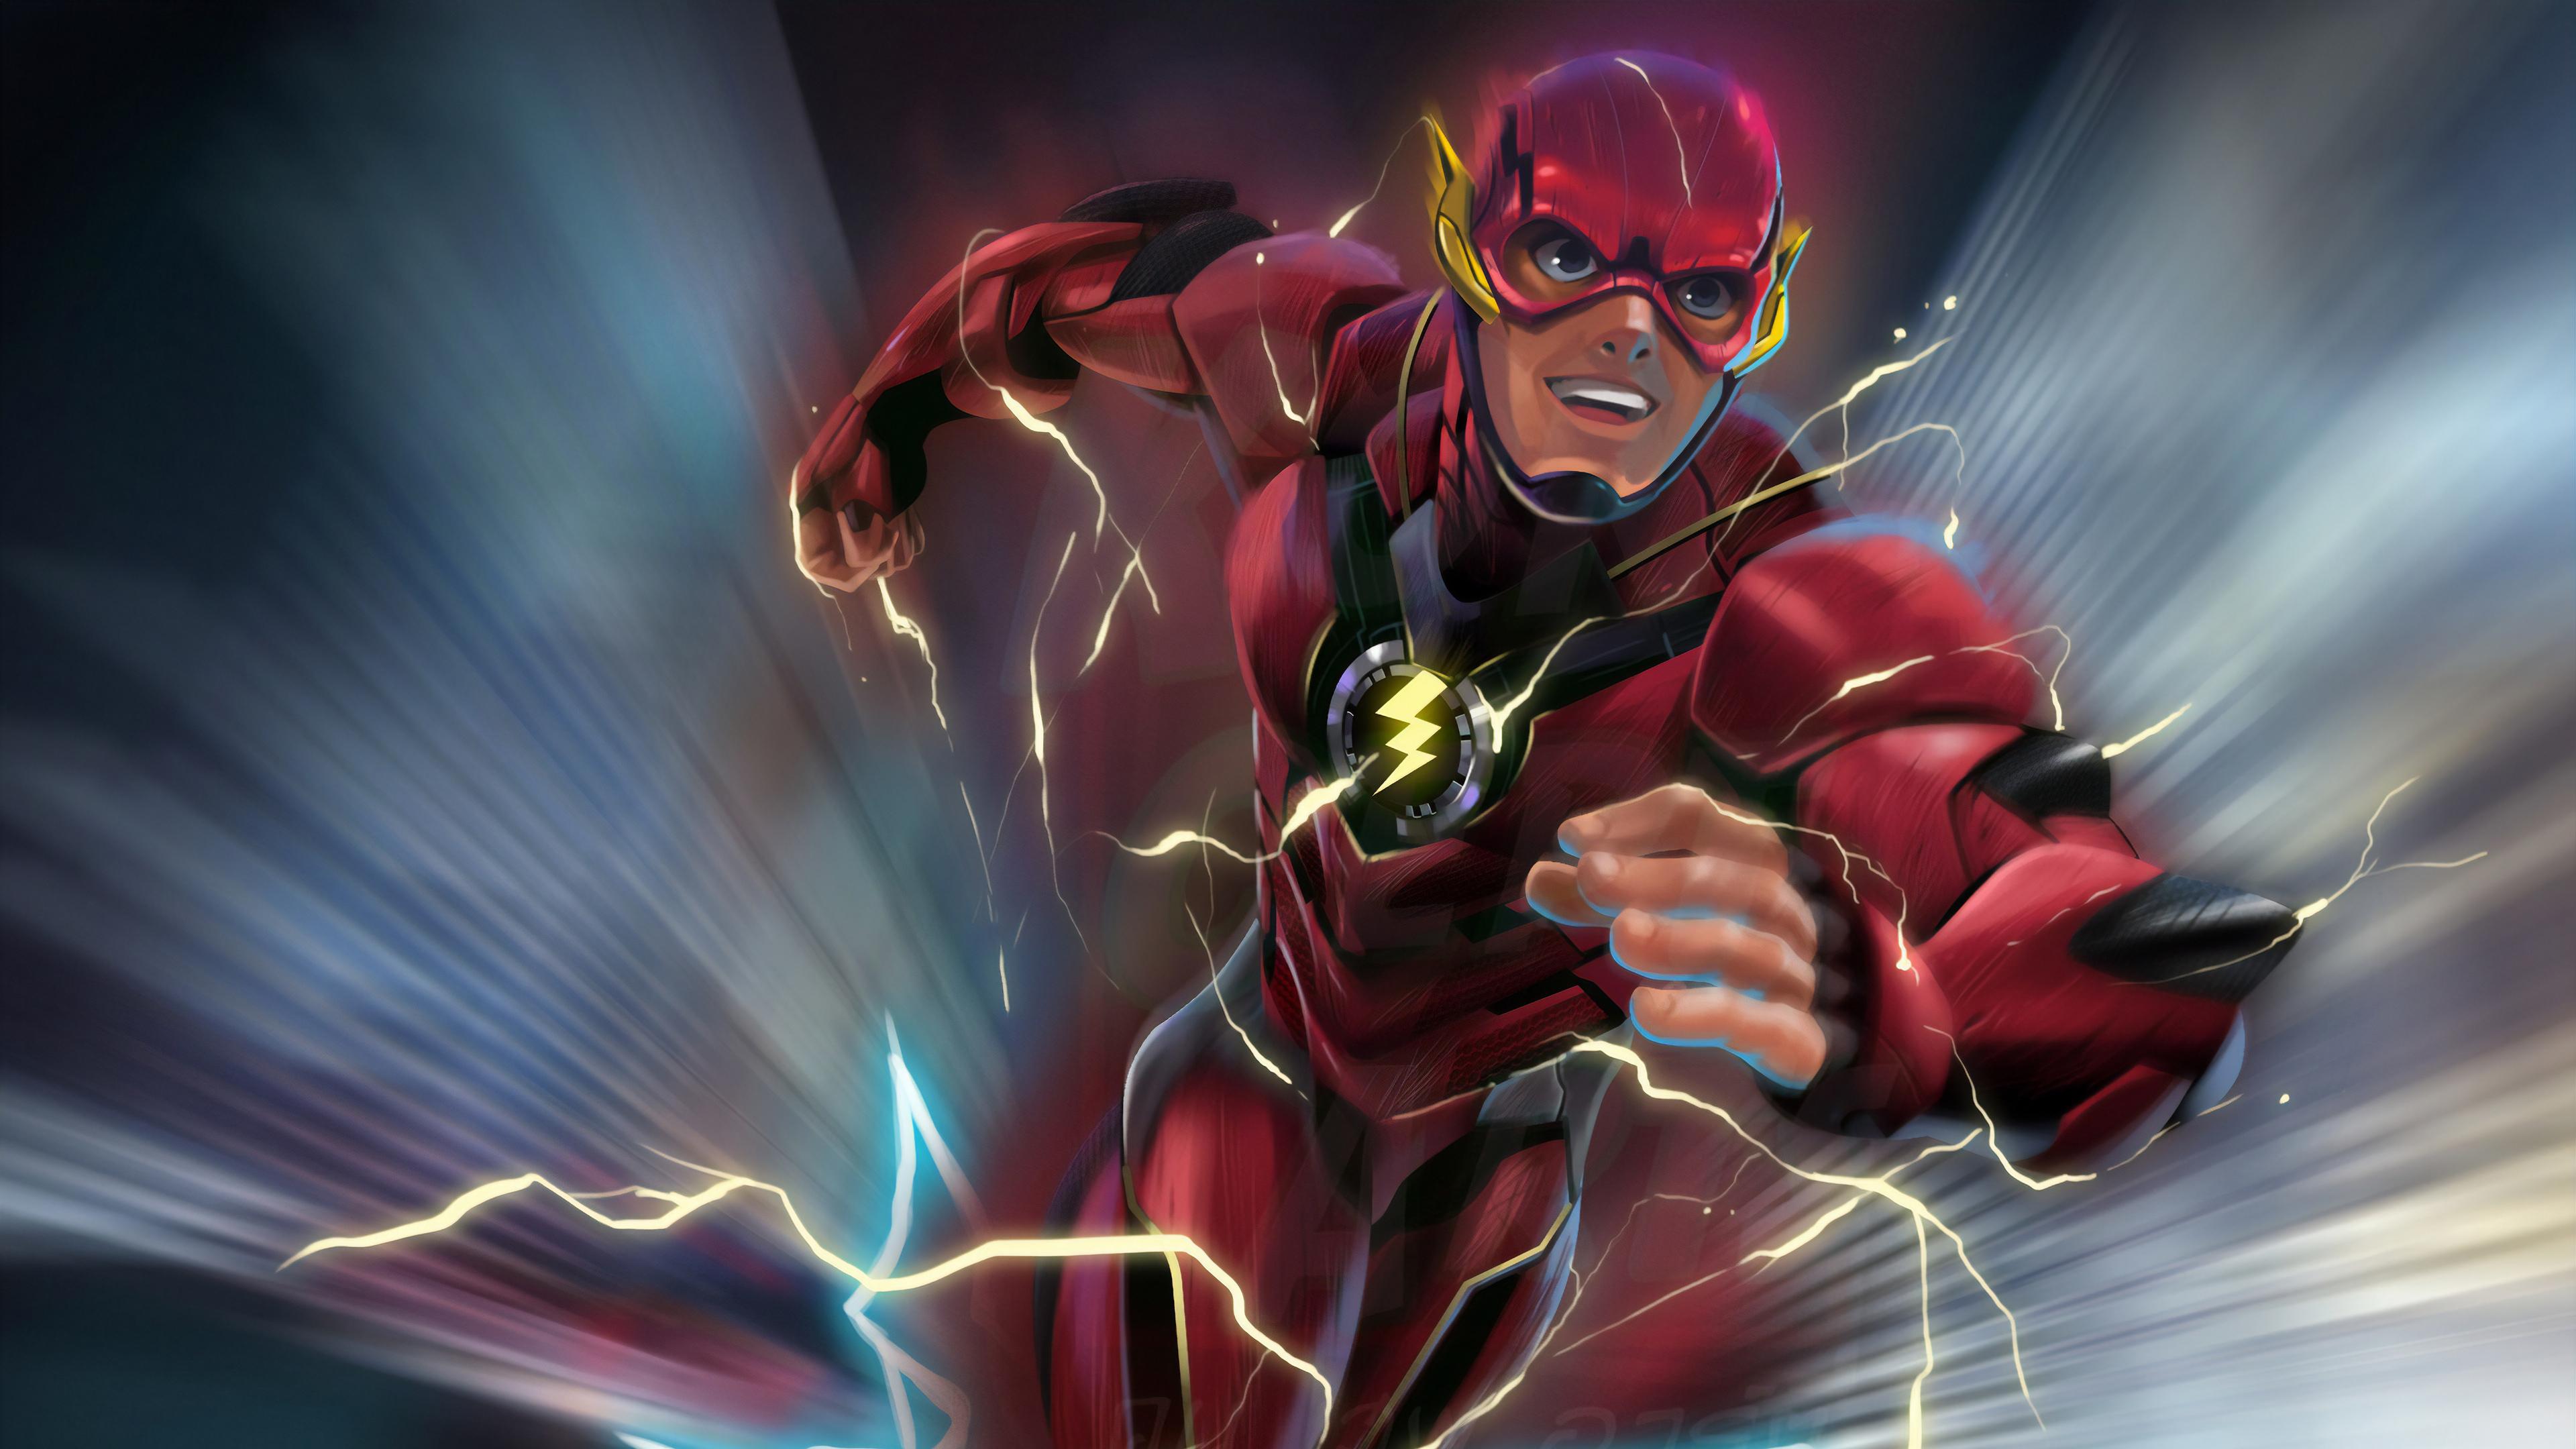 Flash New Artwork 4k, HD Superheroes, 4k Wallpapers ...